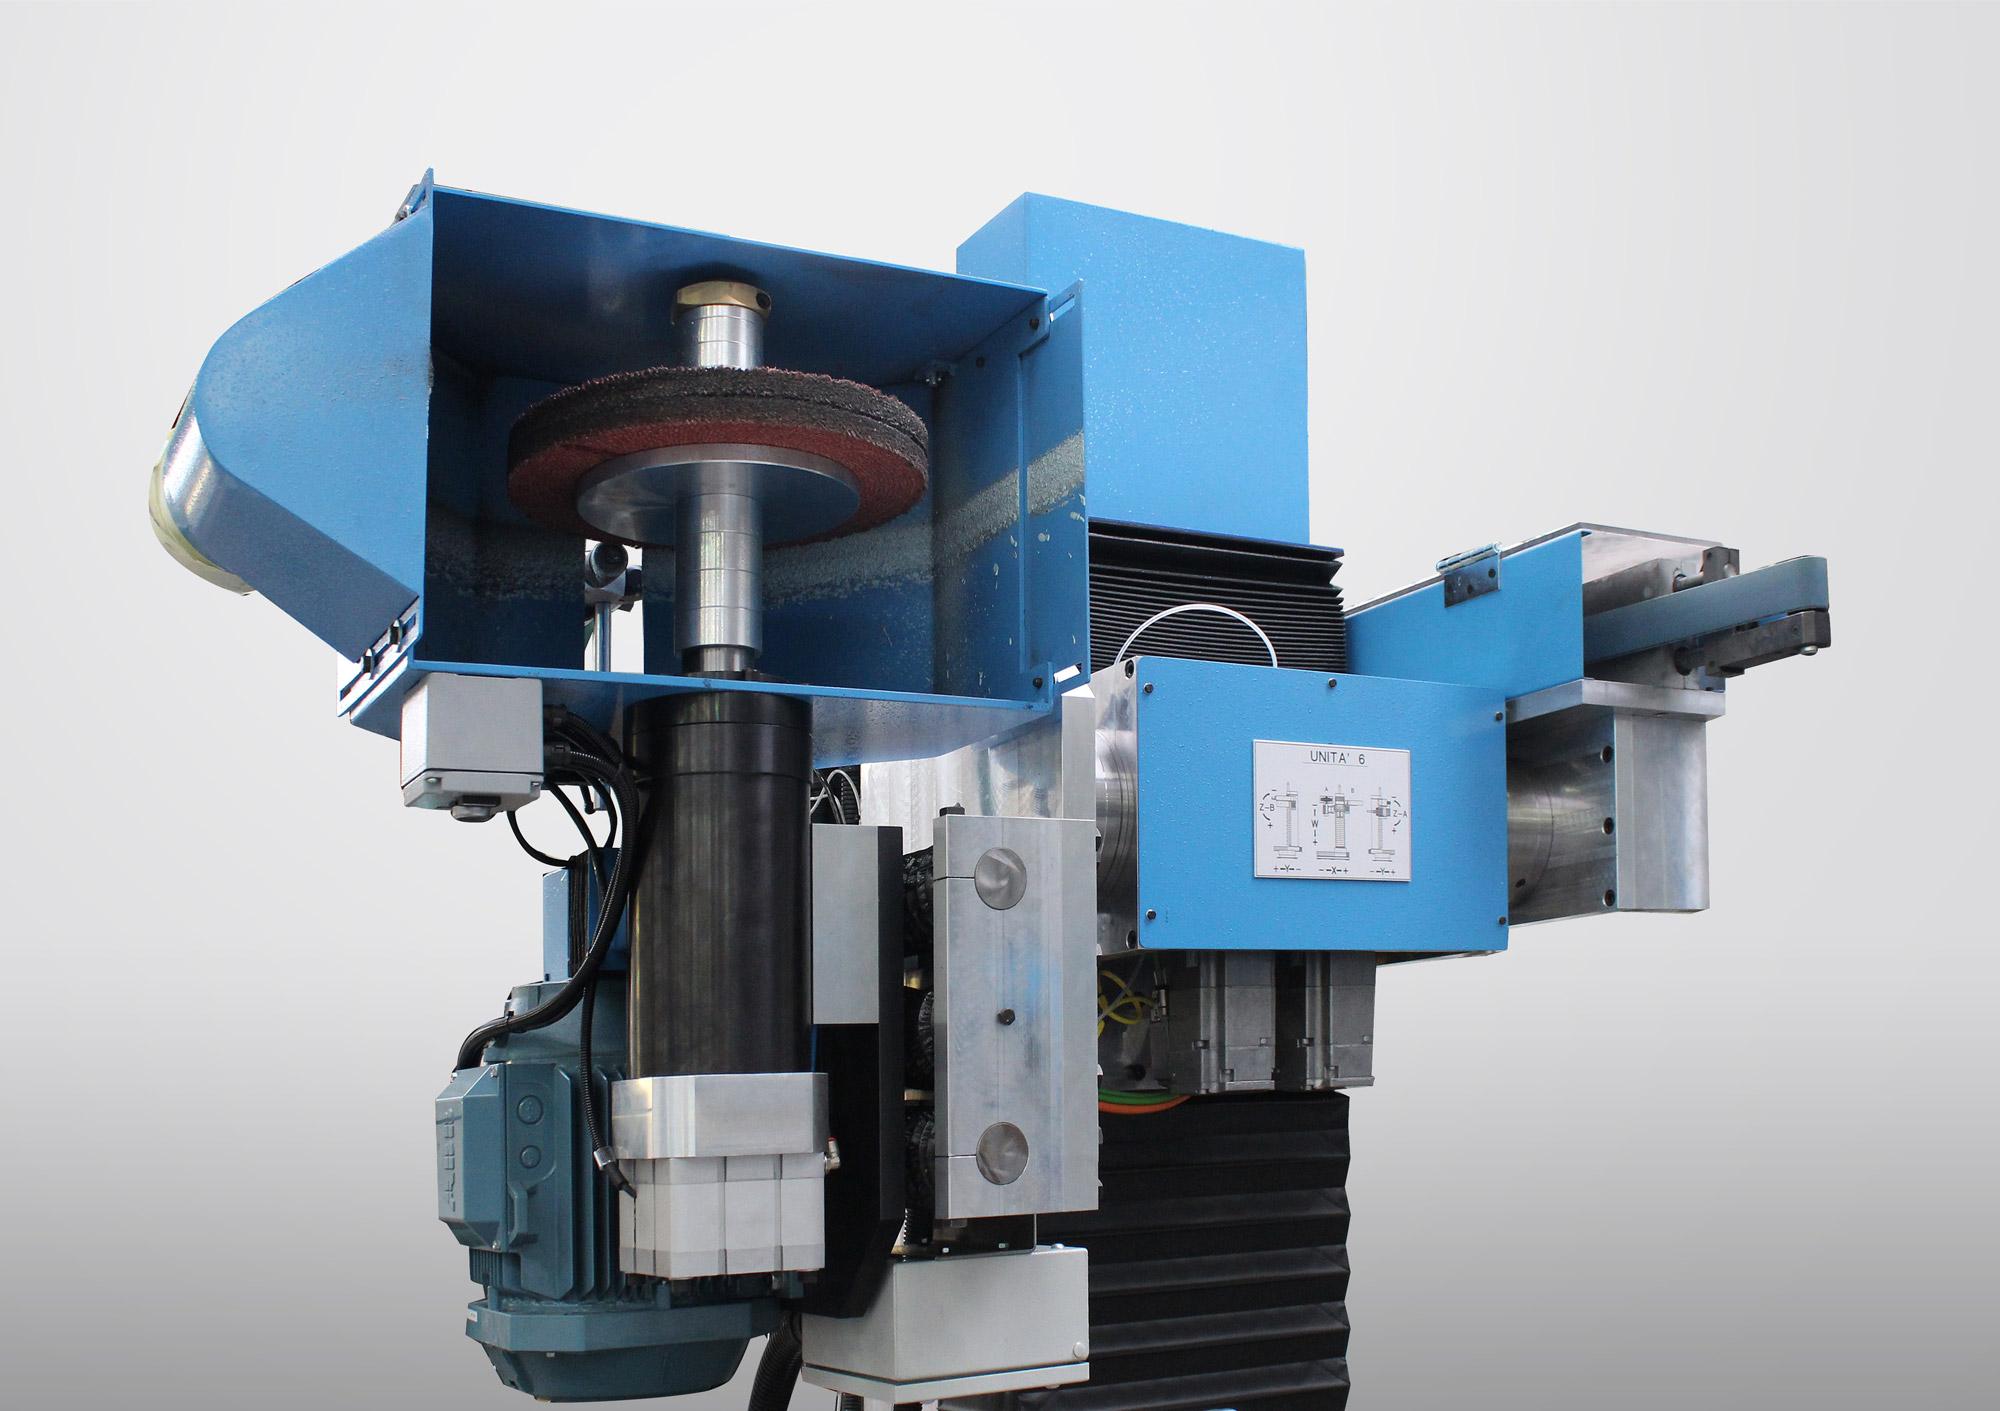 TR+CNC +CNCS Tavola rotante con unità di pulitura CNC e di smerigliatura CNCS